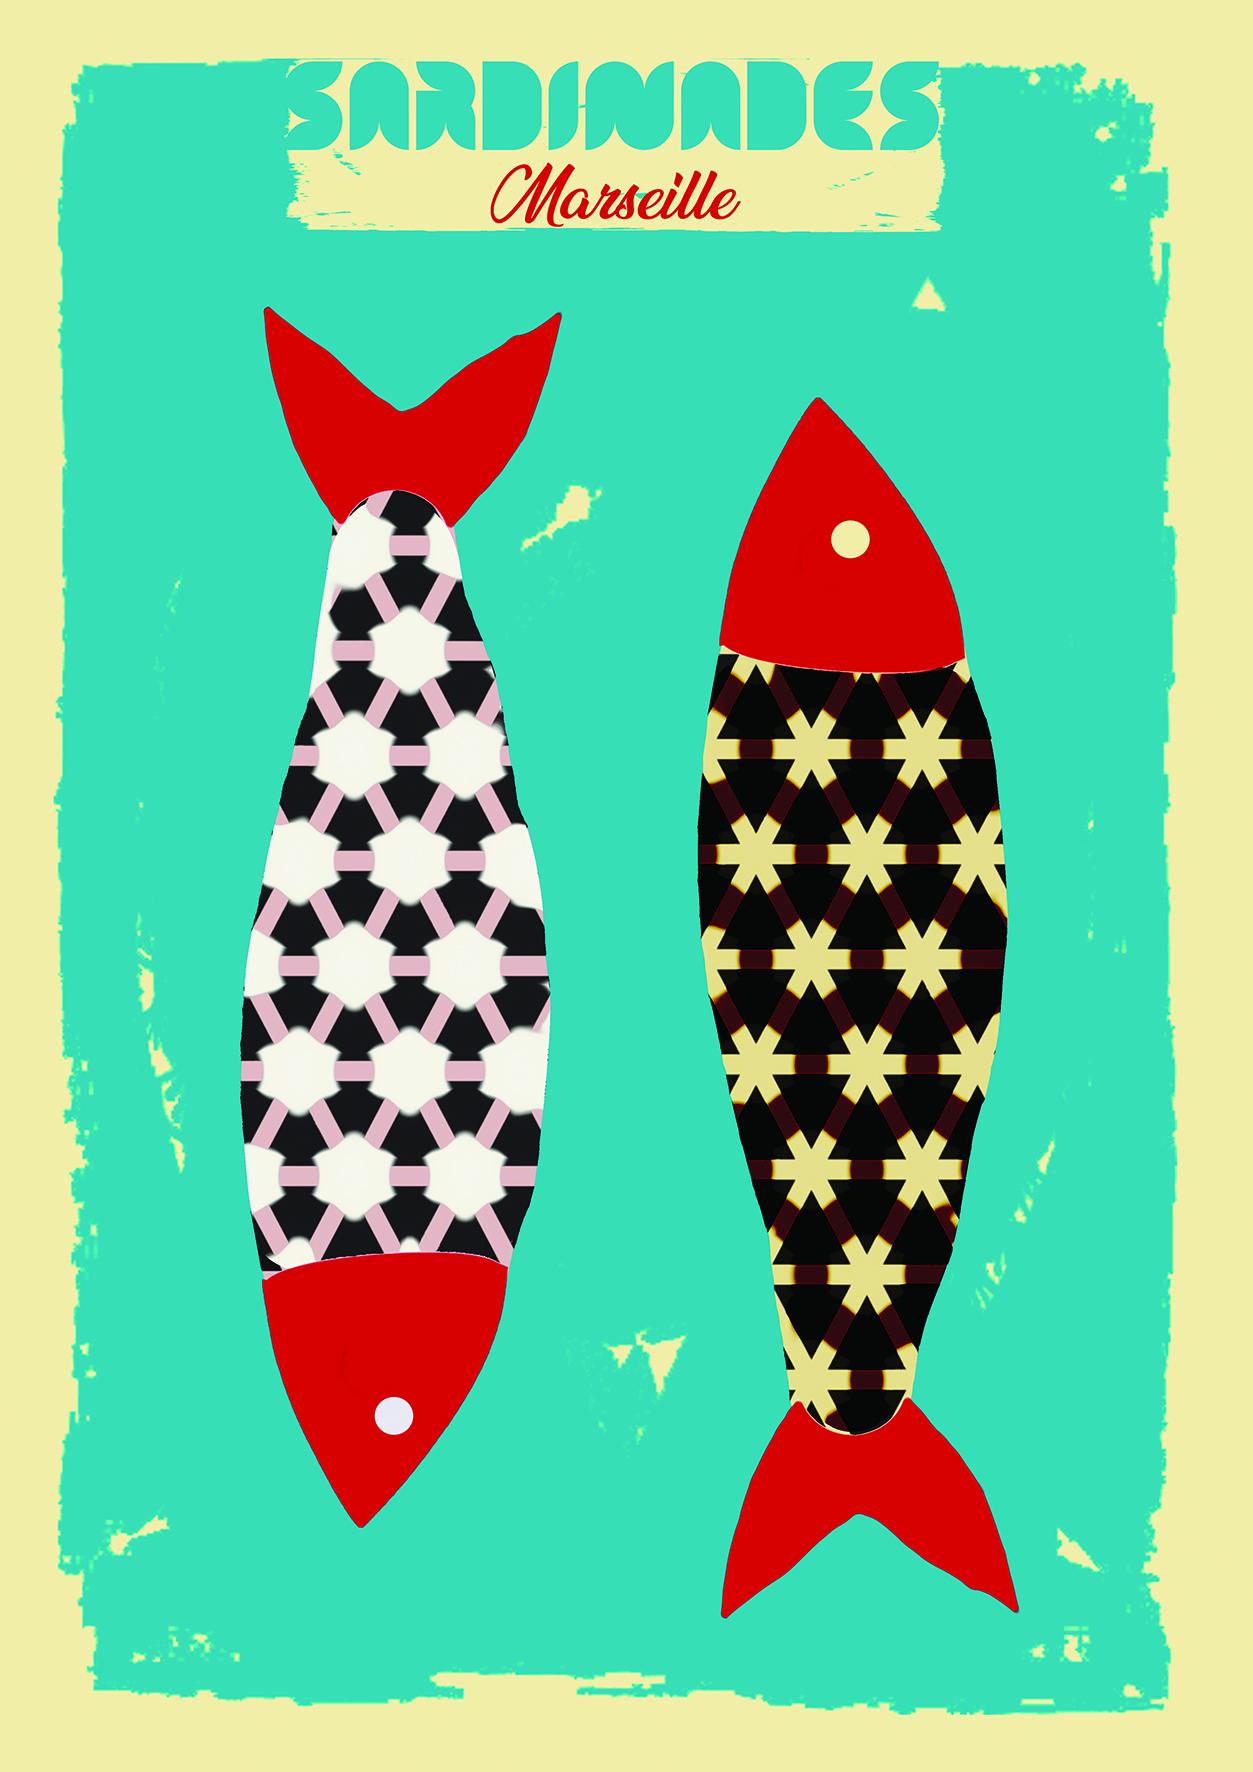 sardinades marseille